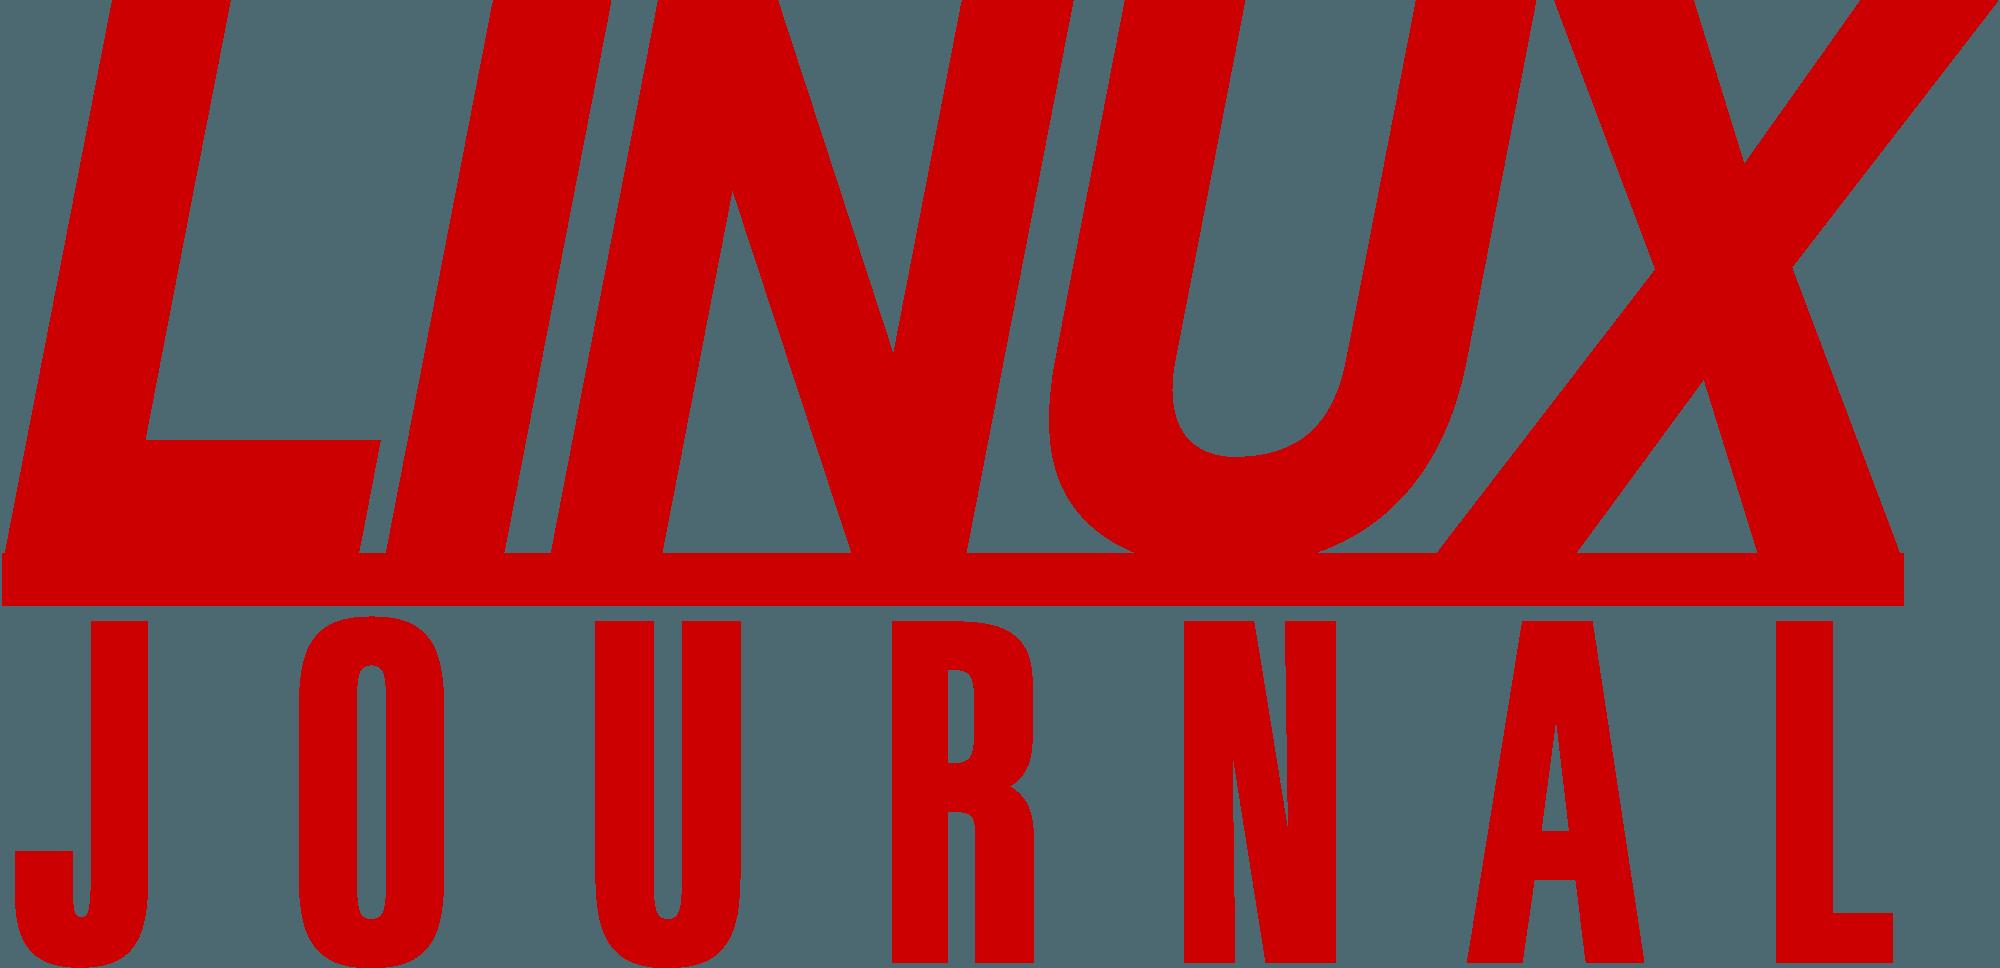 Ecco a voi la guida definitiva ai Laptop Linux, gentilmente offerta da LinuxJournal!